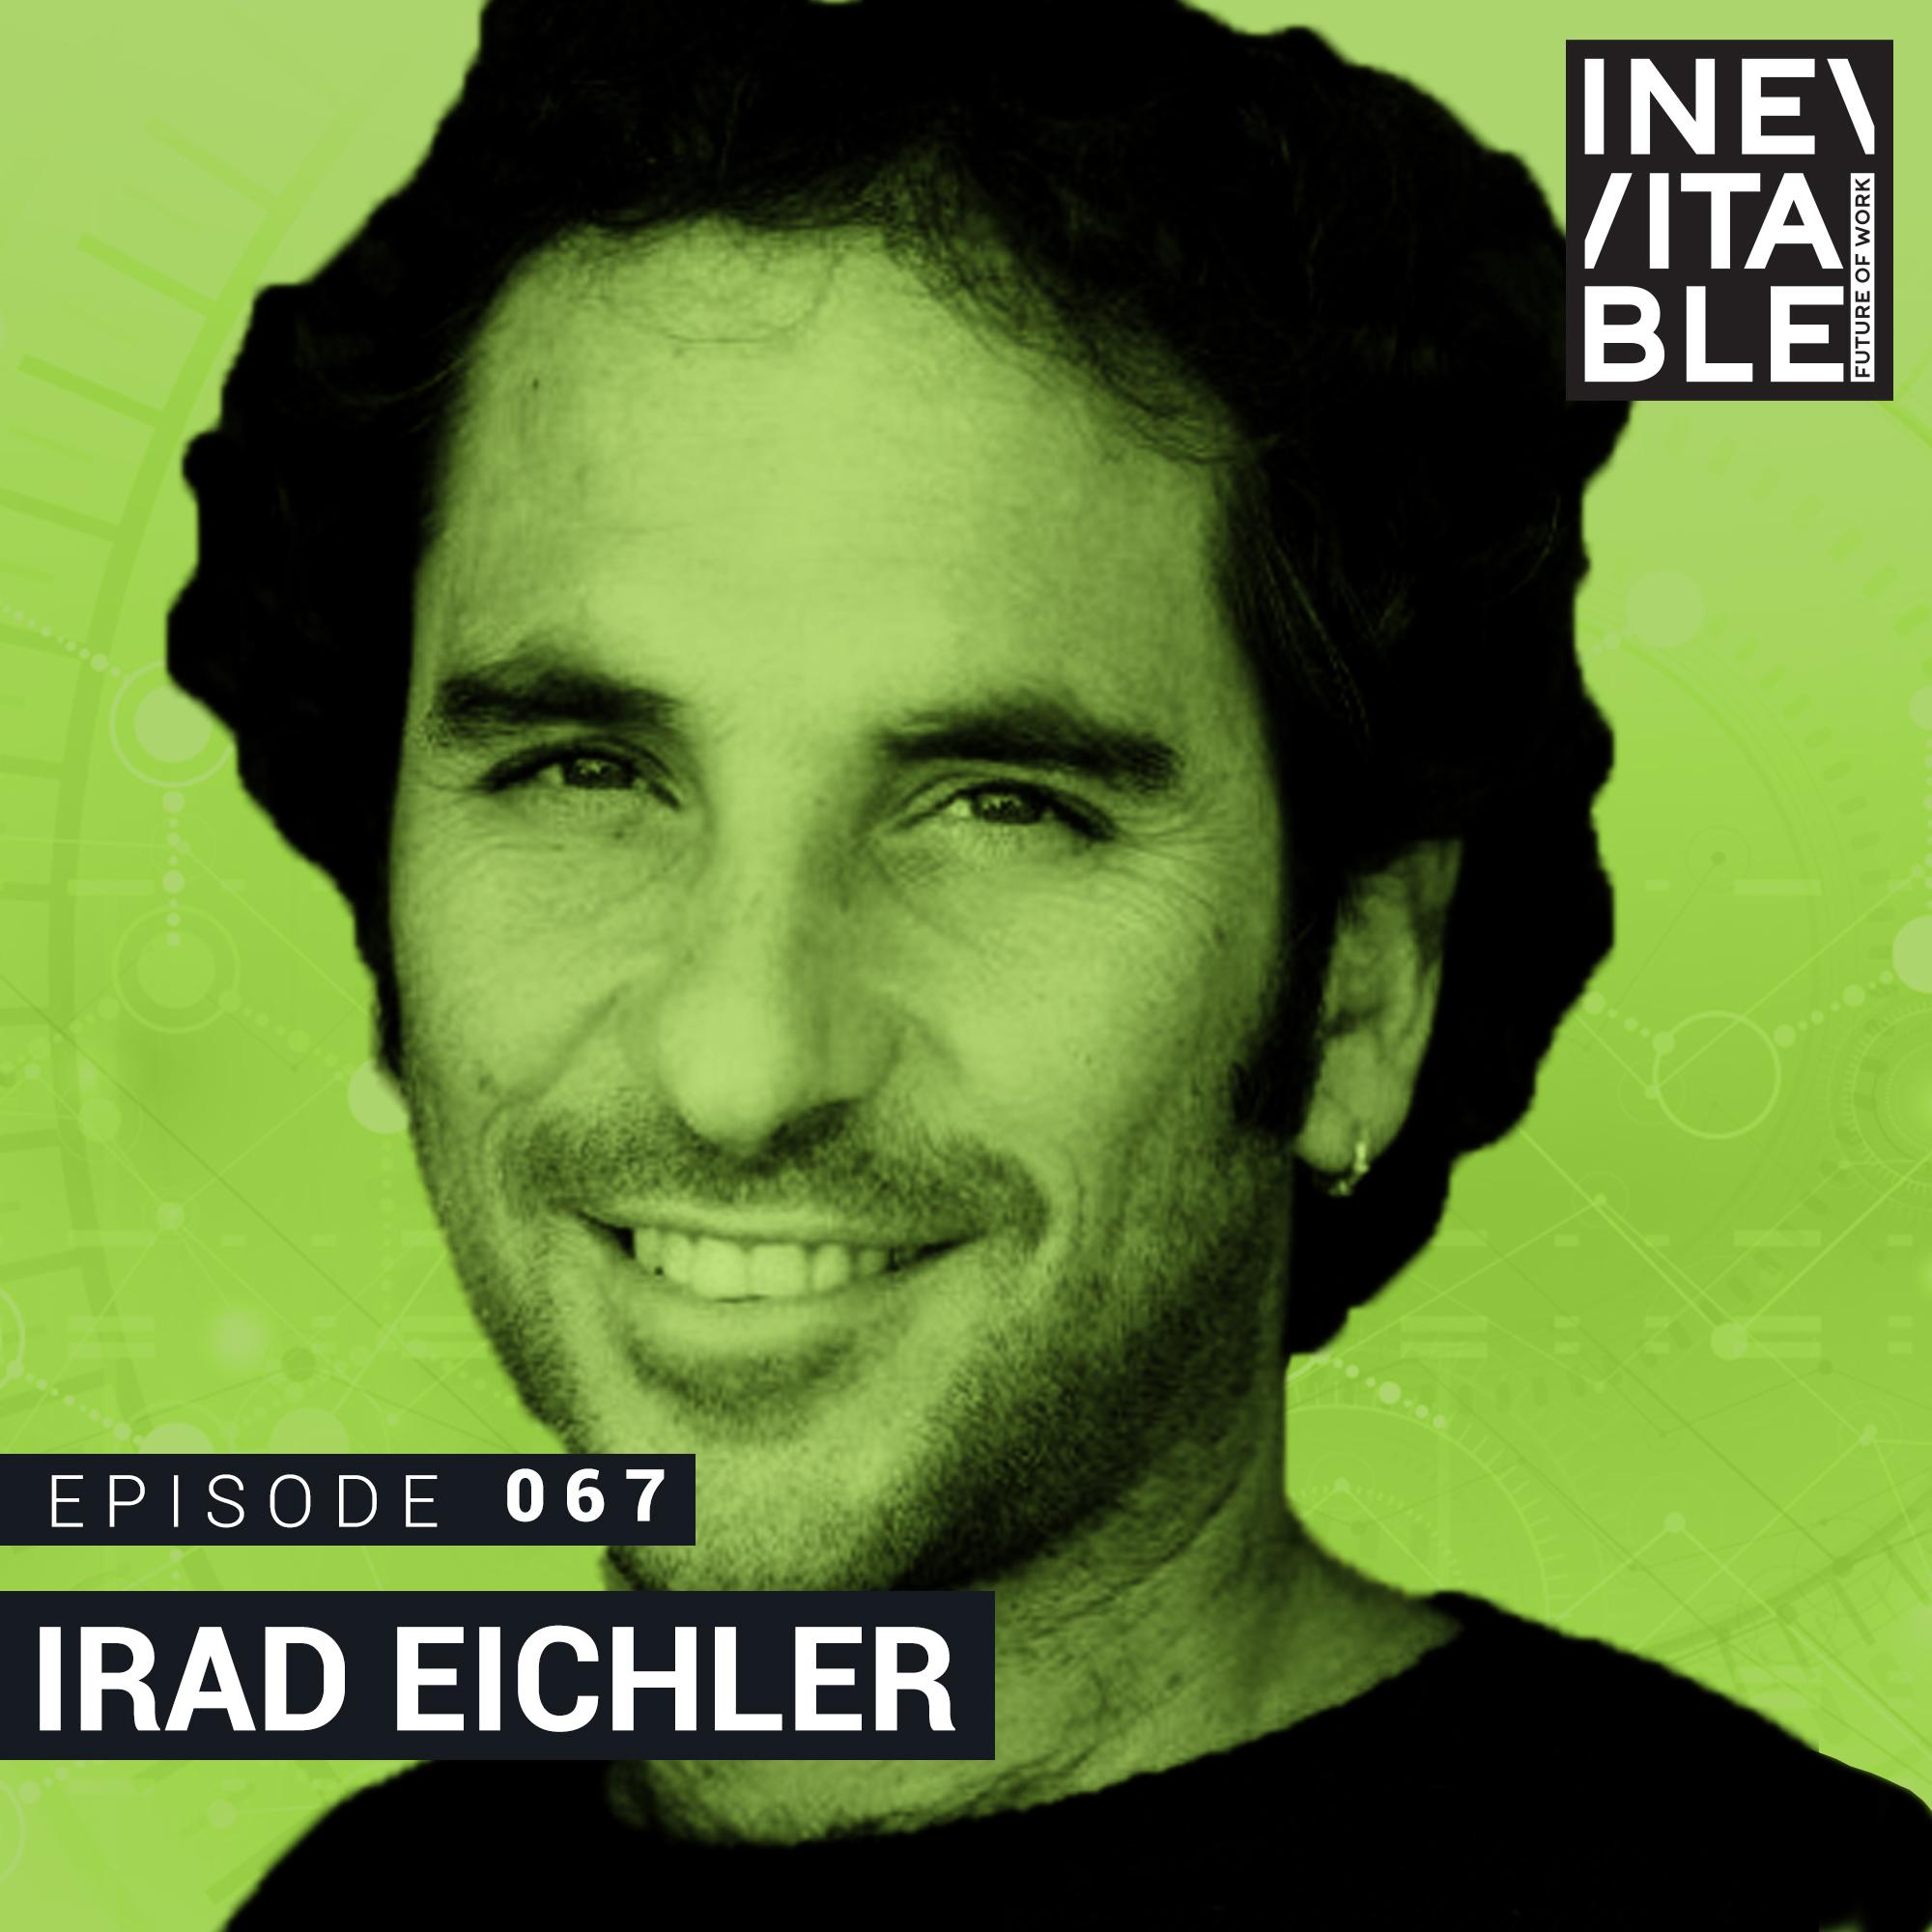 Irad Eichler